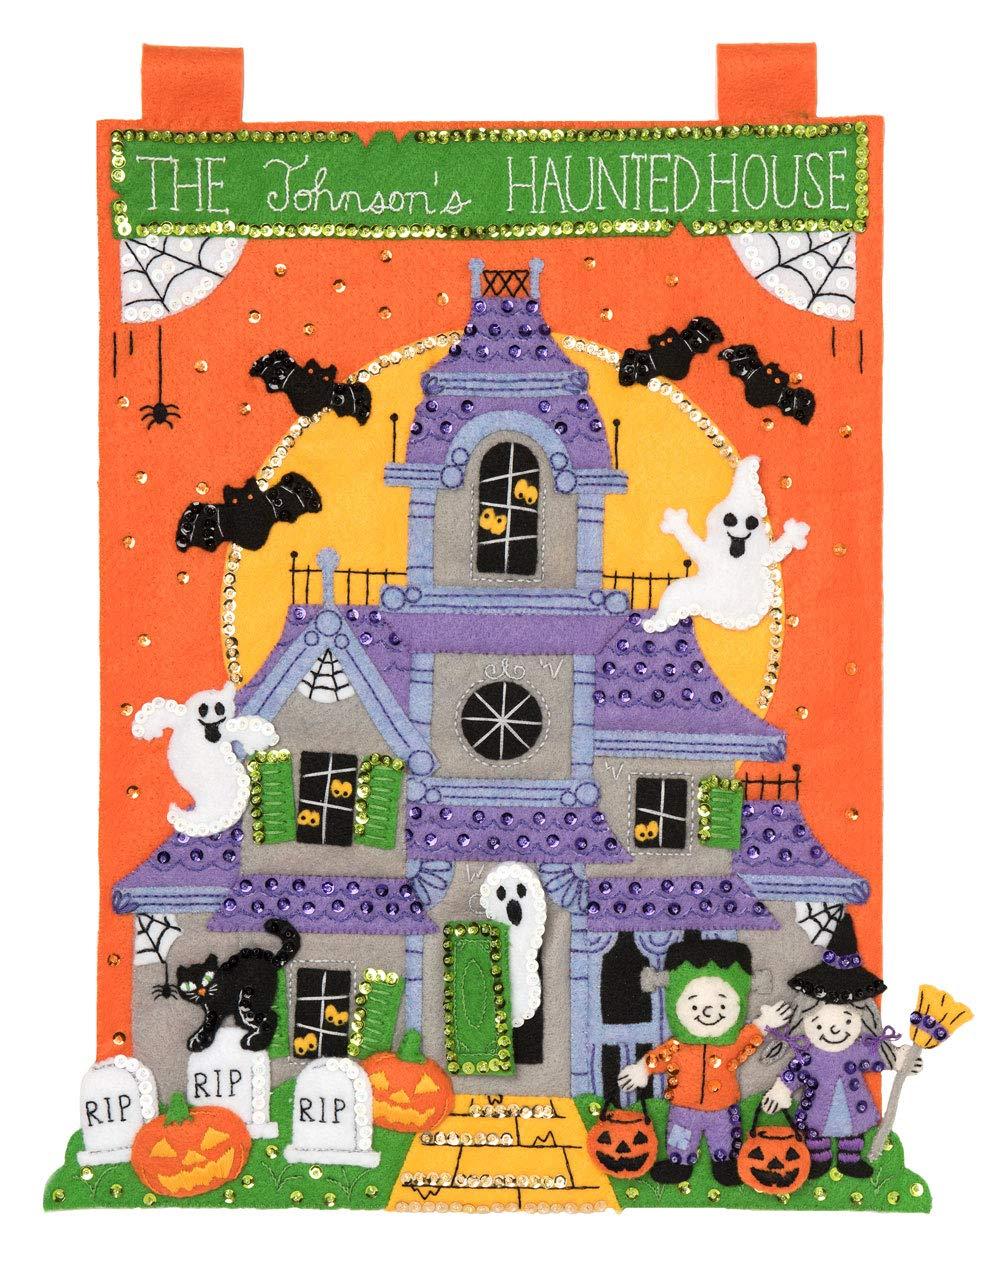 Bucilla Felt Applique Wall Hanging Kit, 14 by 18-Inch, 86920E The Haunted House Plaid Enterprises